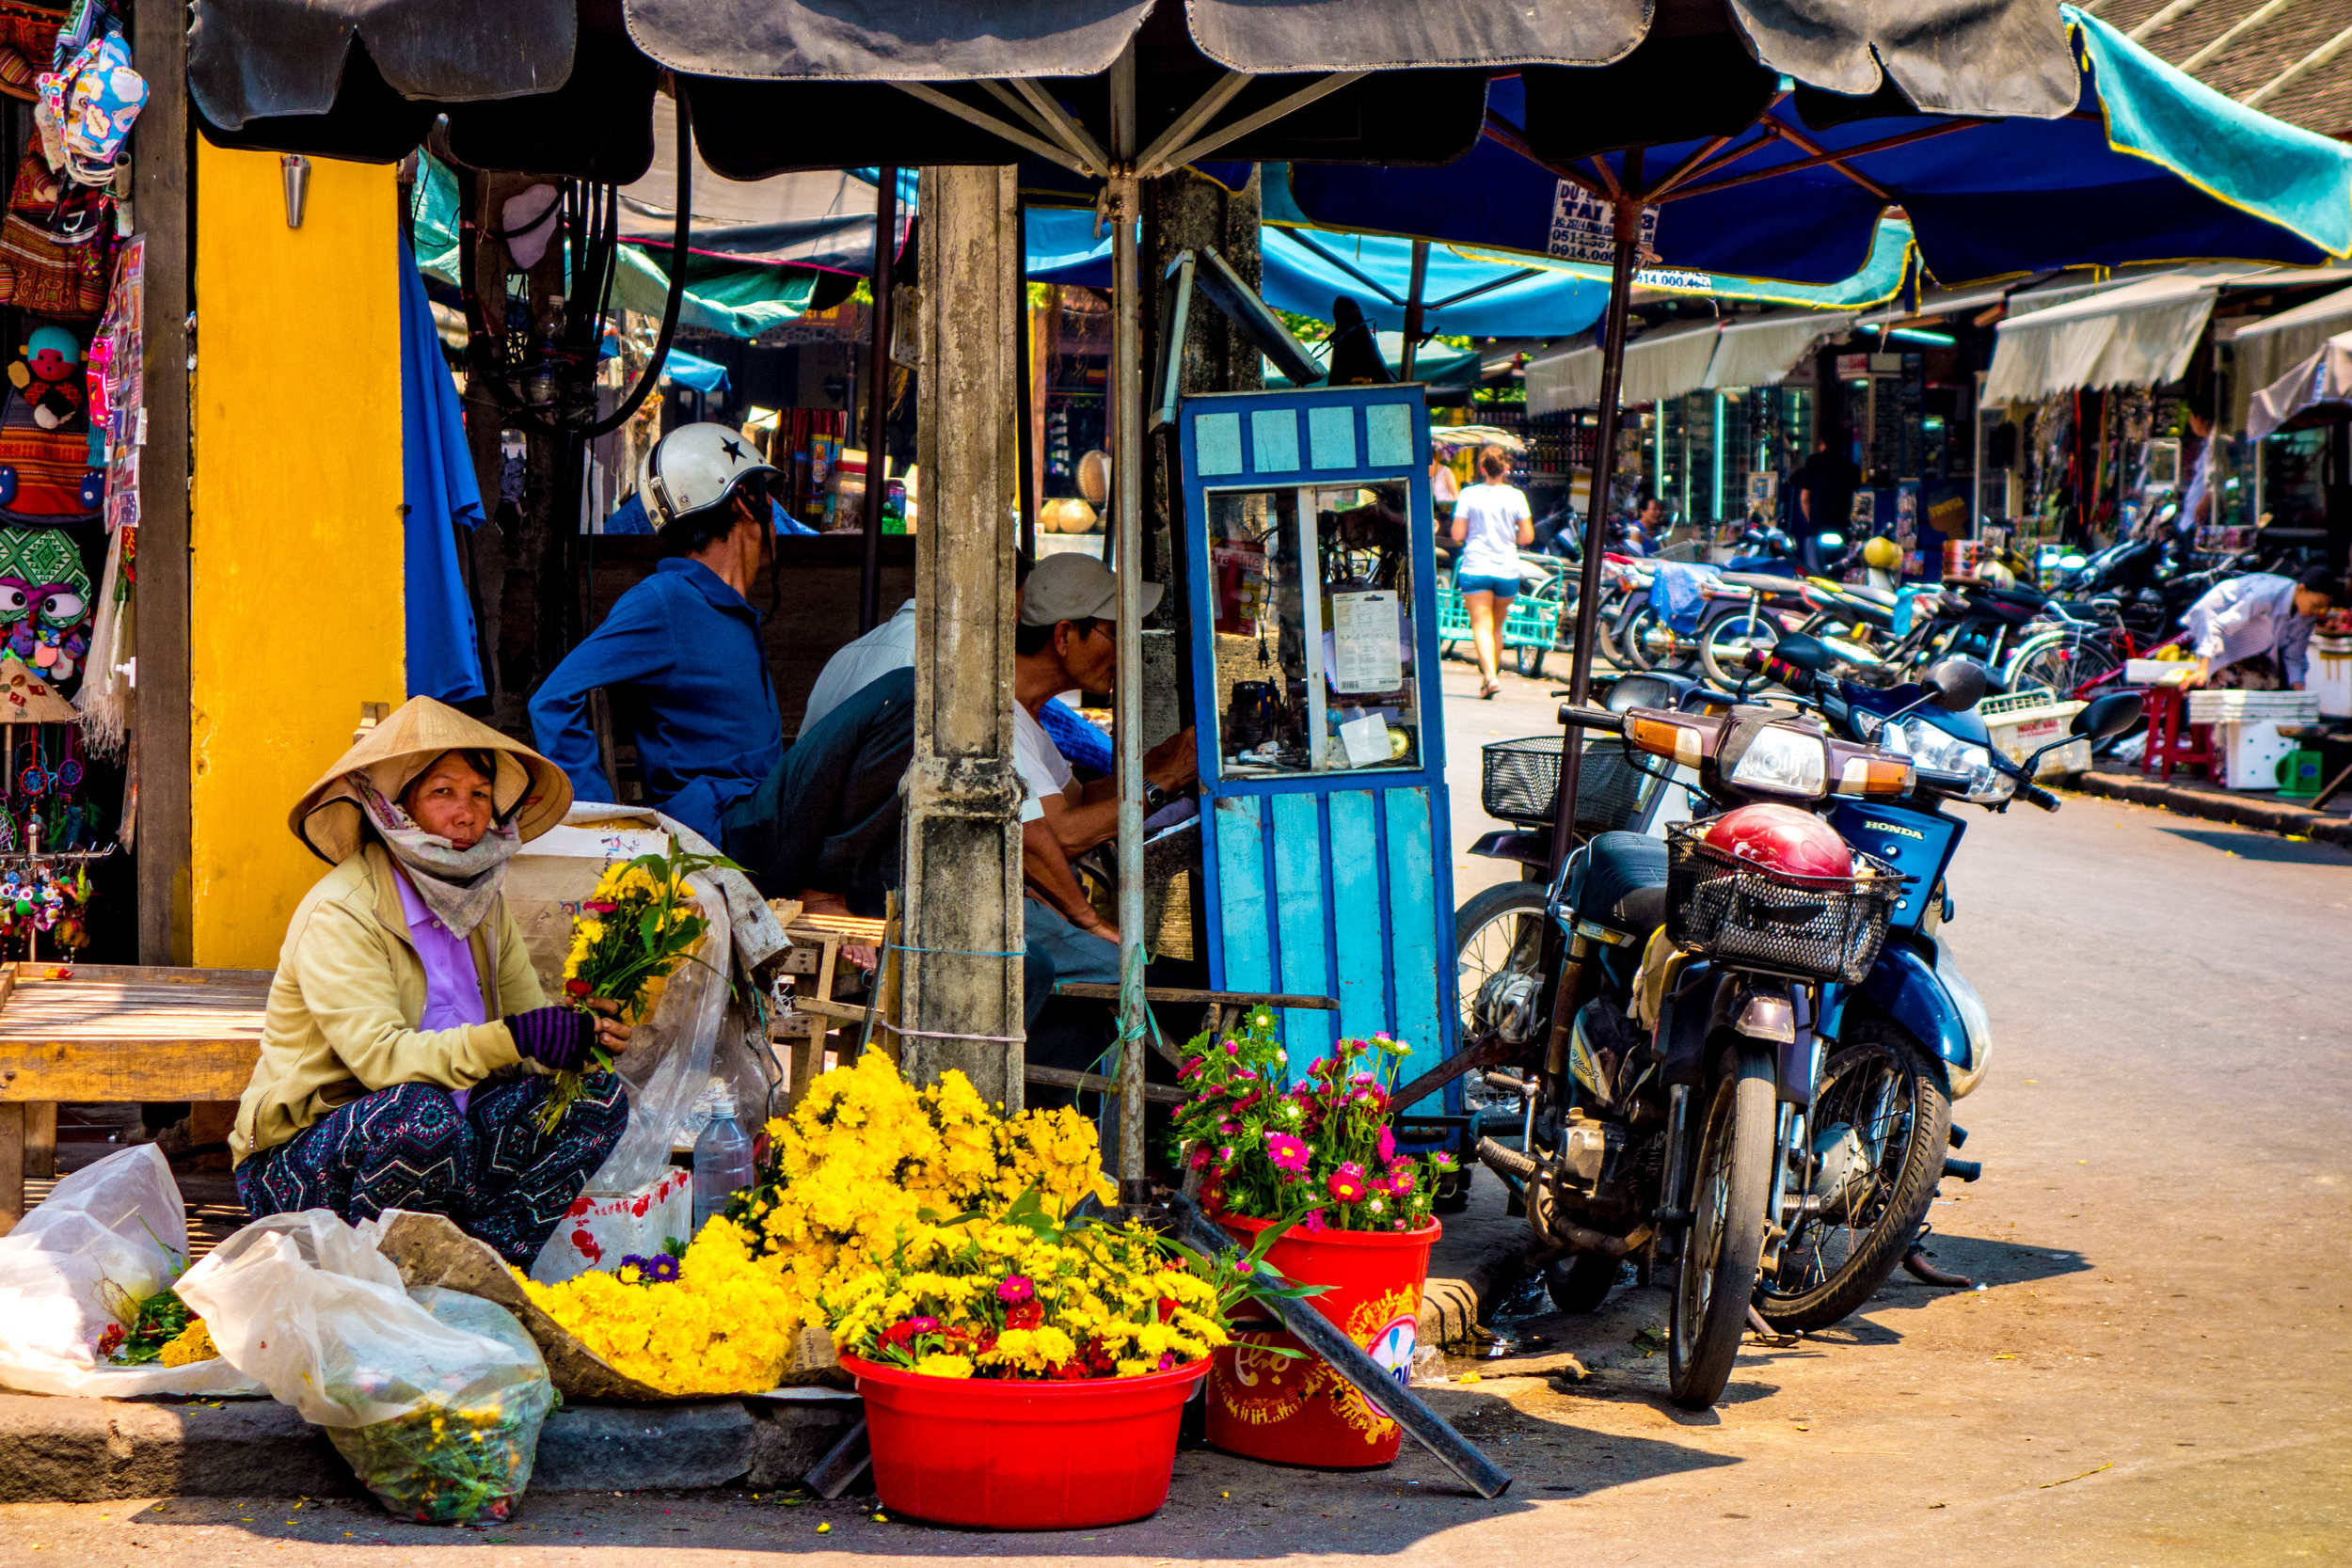 Street vendor in Hoi An, Vietnam